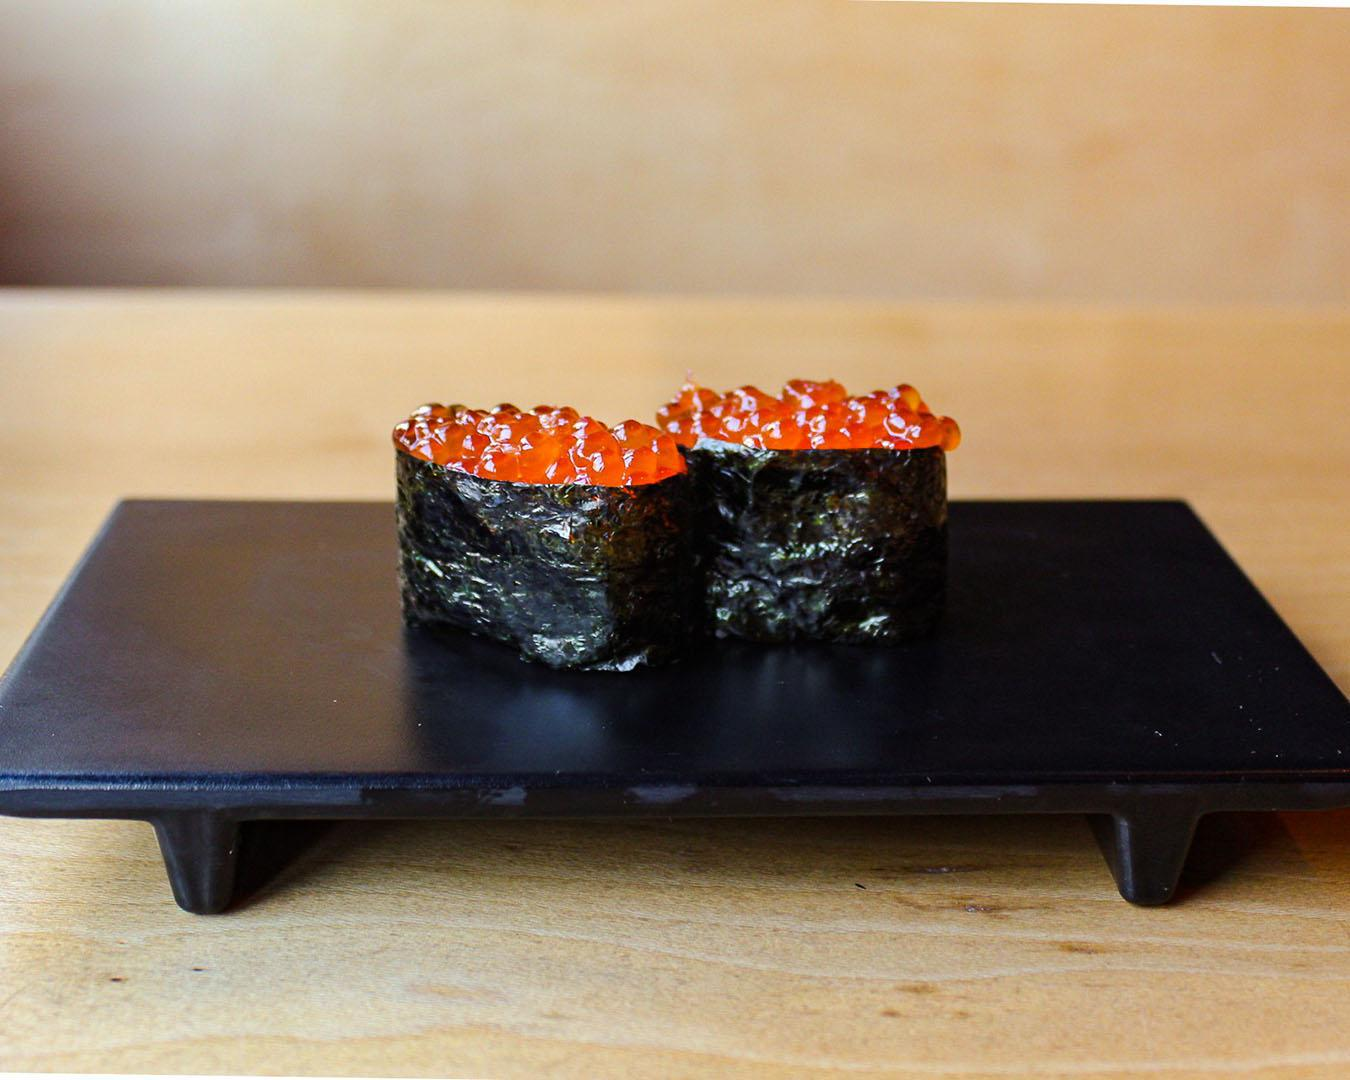 Ikura/Wild Salmon Roe*